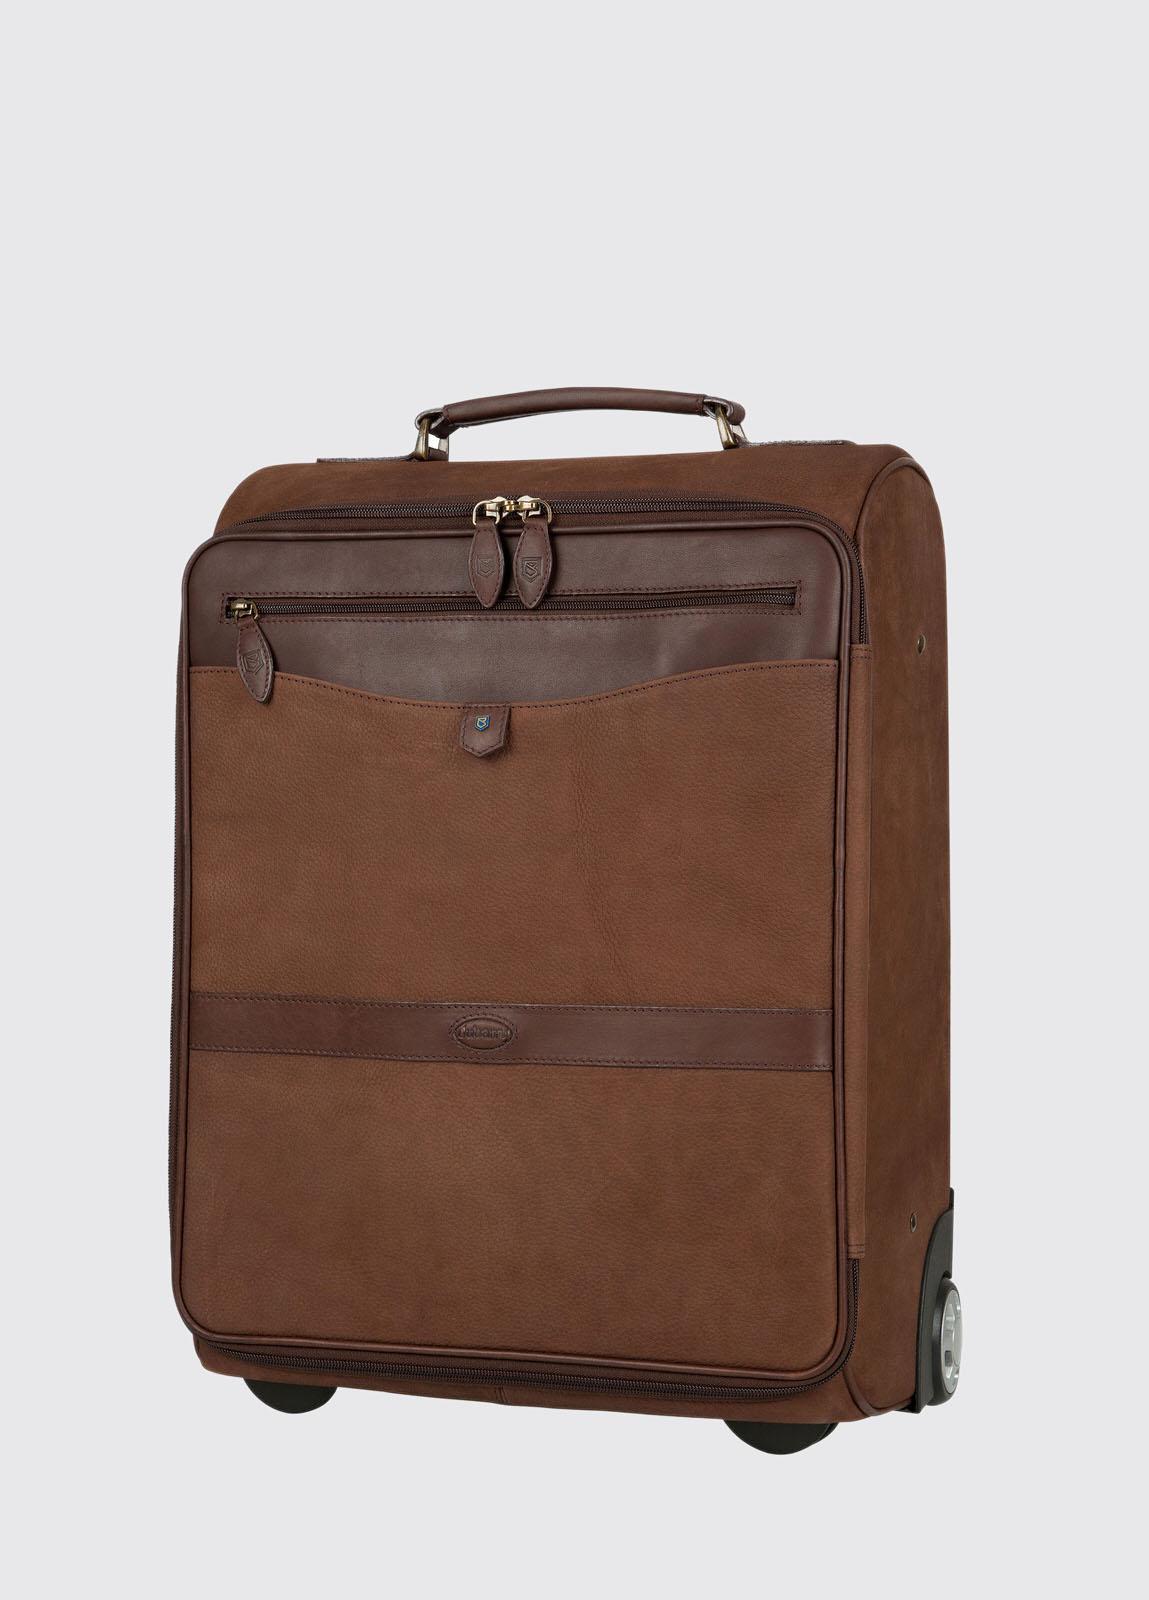 Gulliver Leather Carry On Case - Walnut